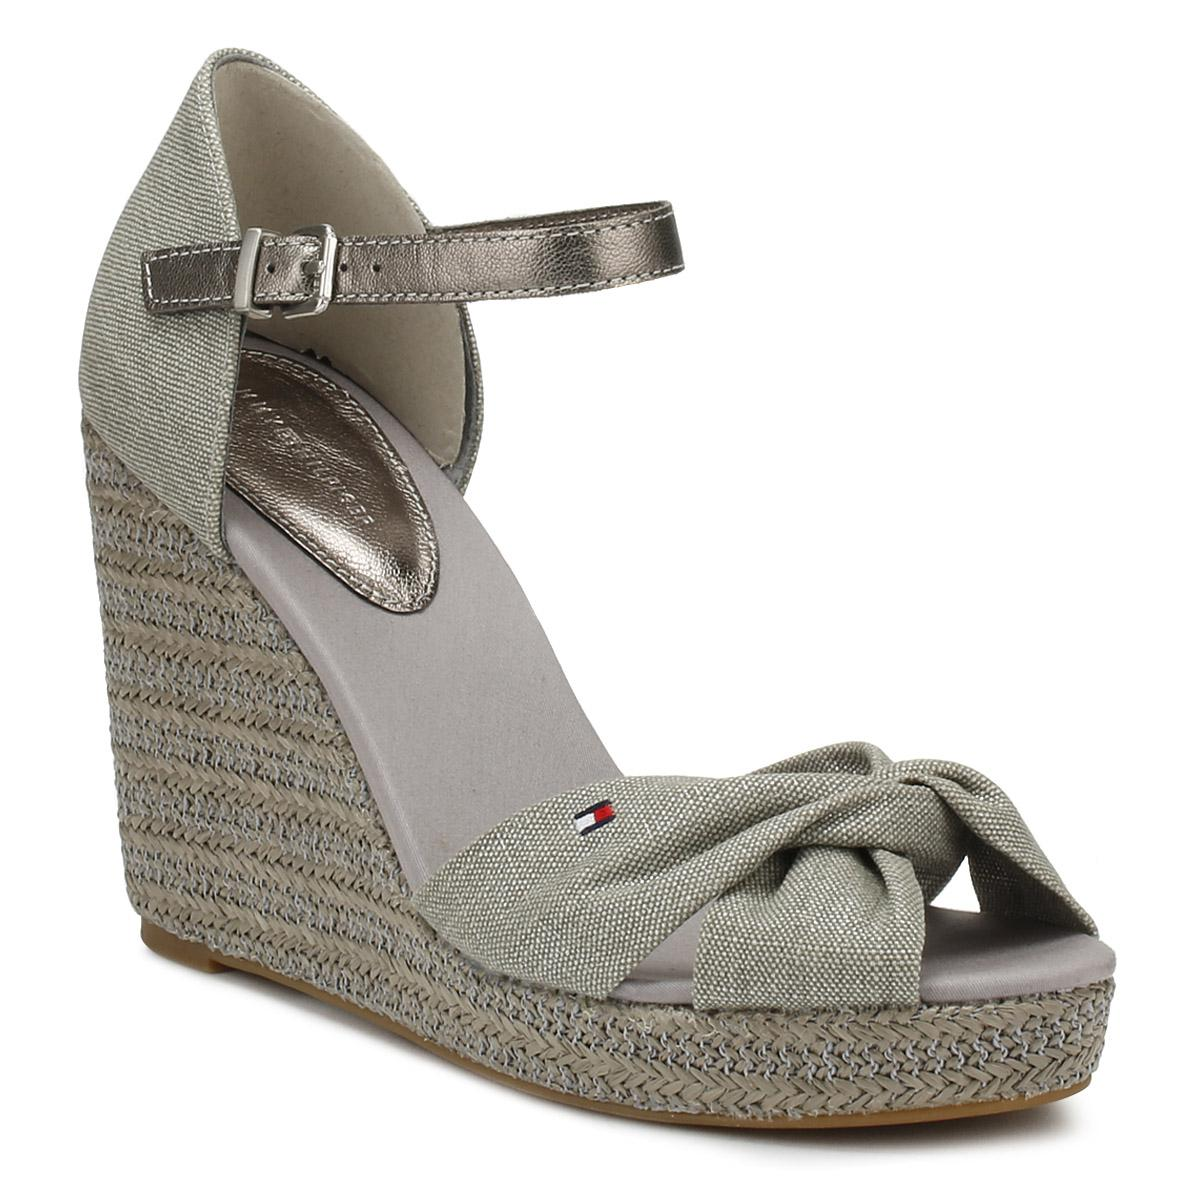 57a145b1781836 Lyst - Tommy Hilfiger Womens Light Grey Metallic Elena Wedge Sandals ...